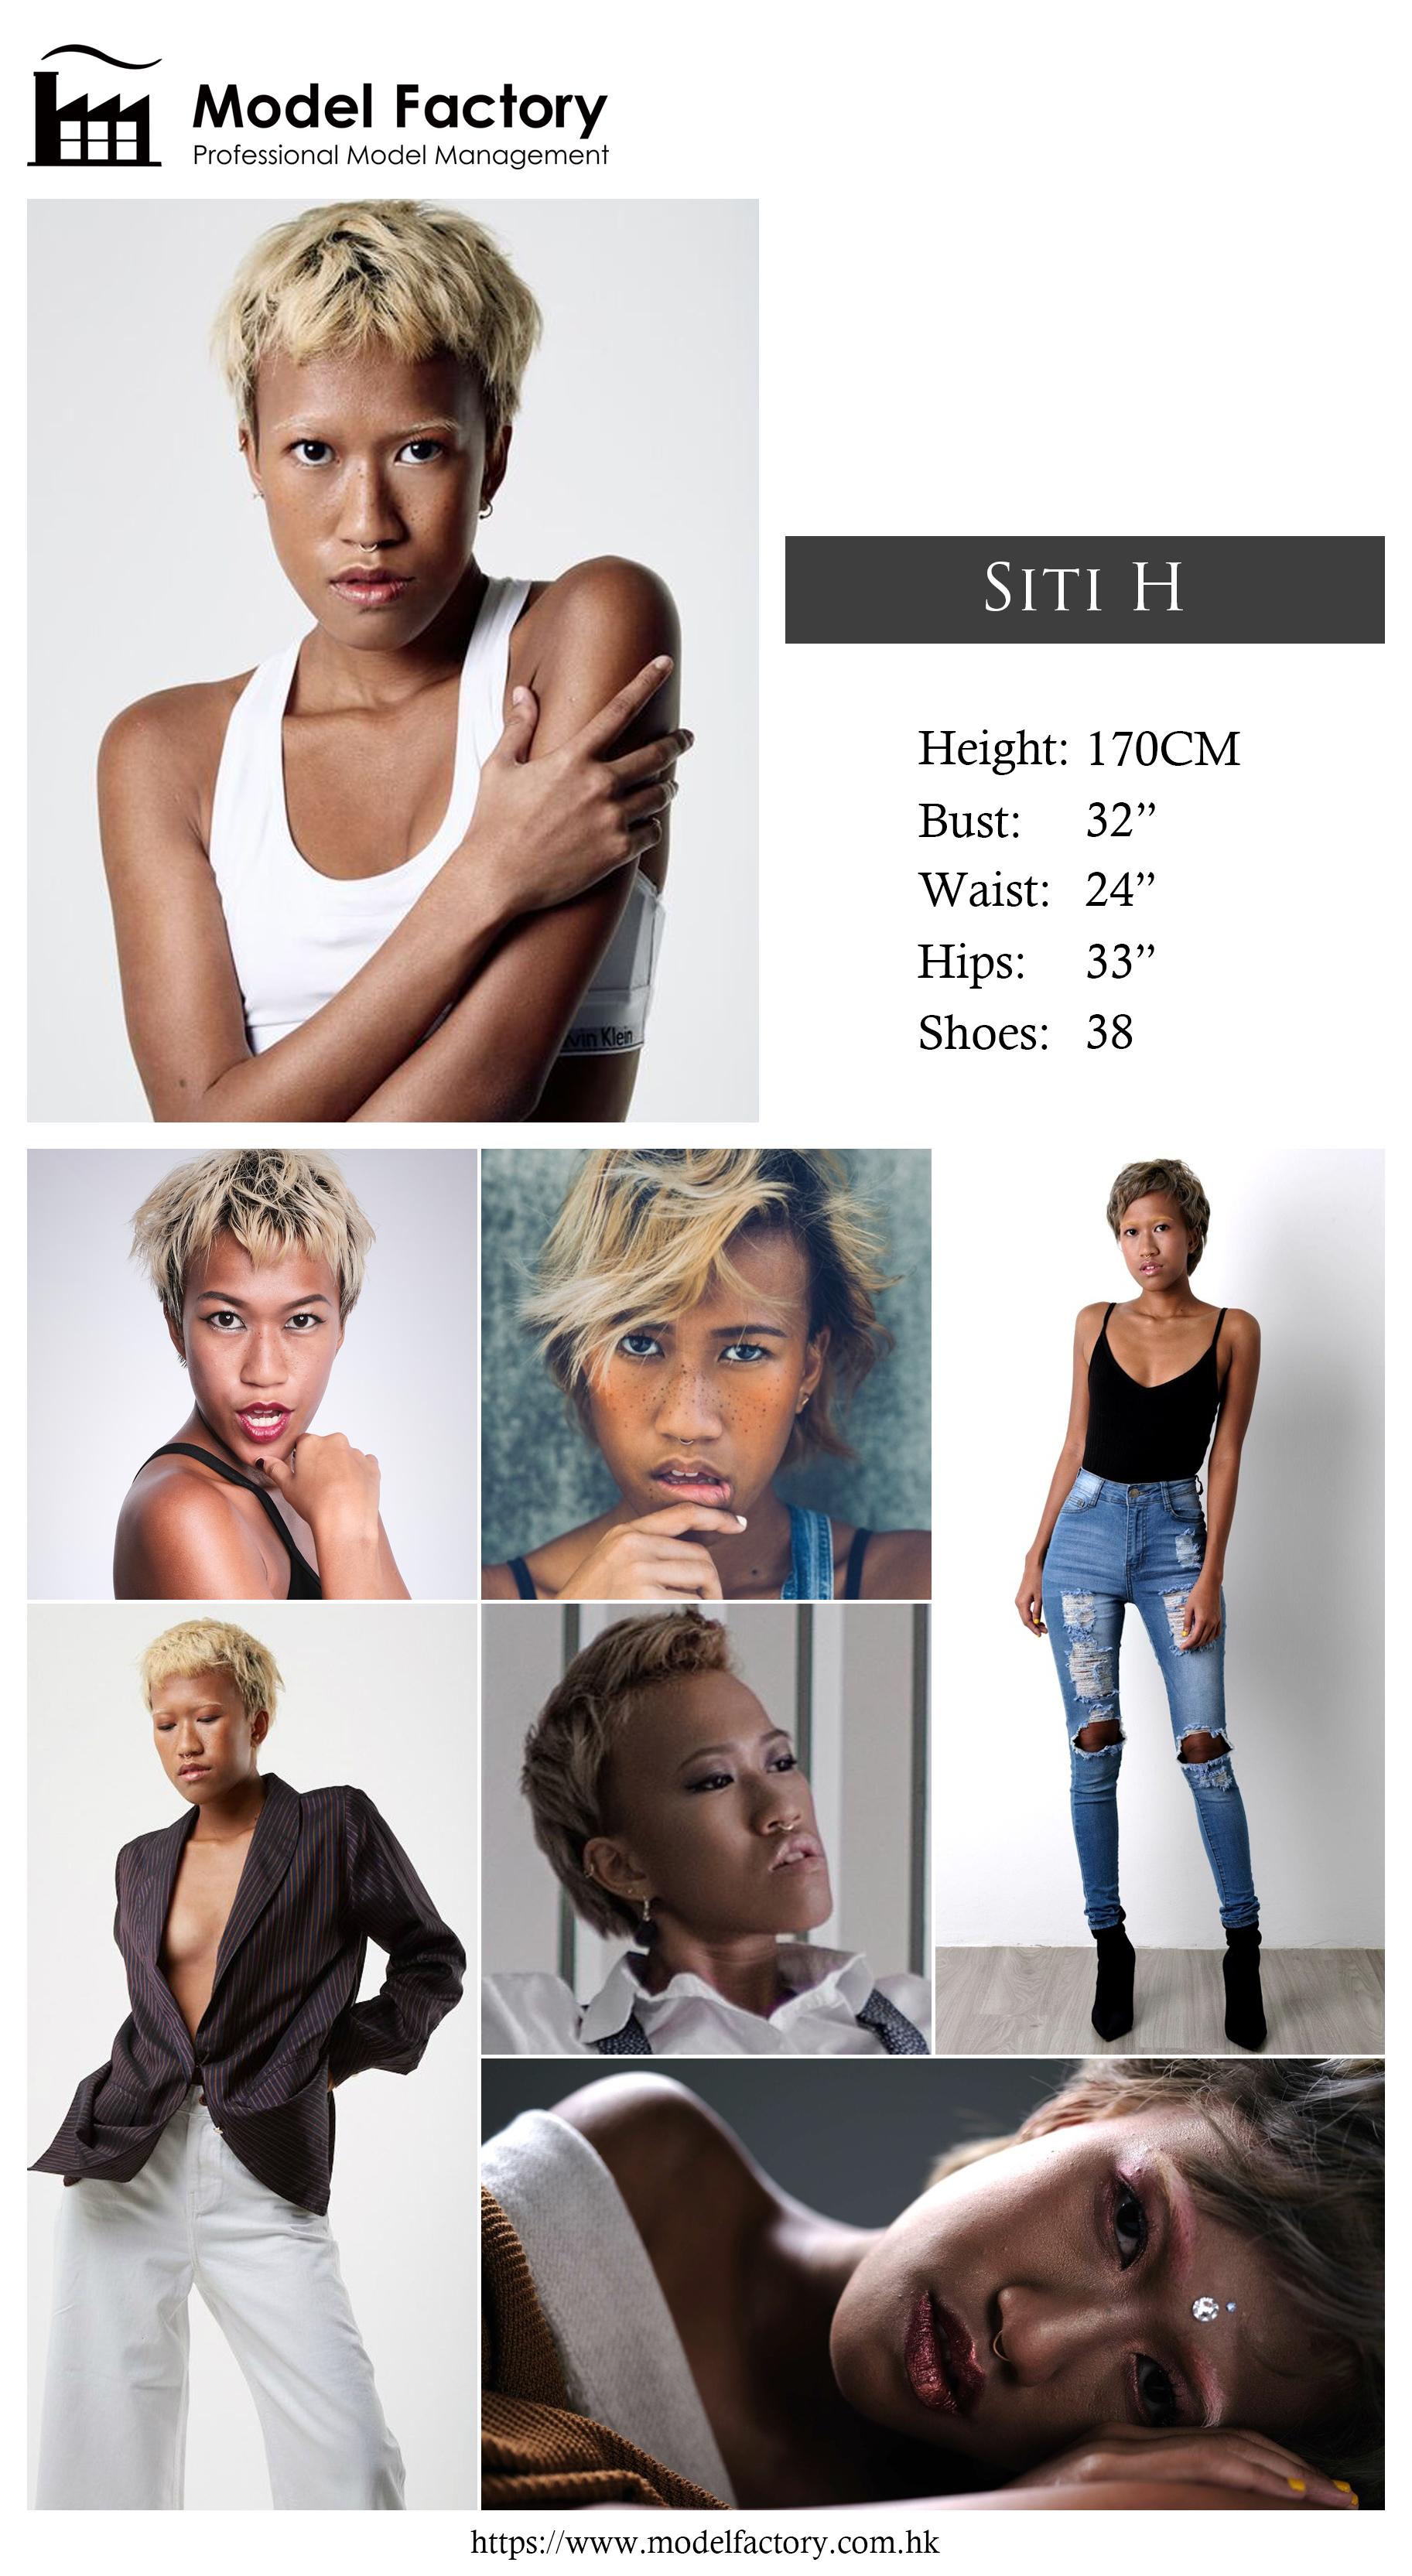 Model Factory Black Model SitiH